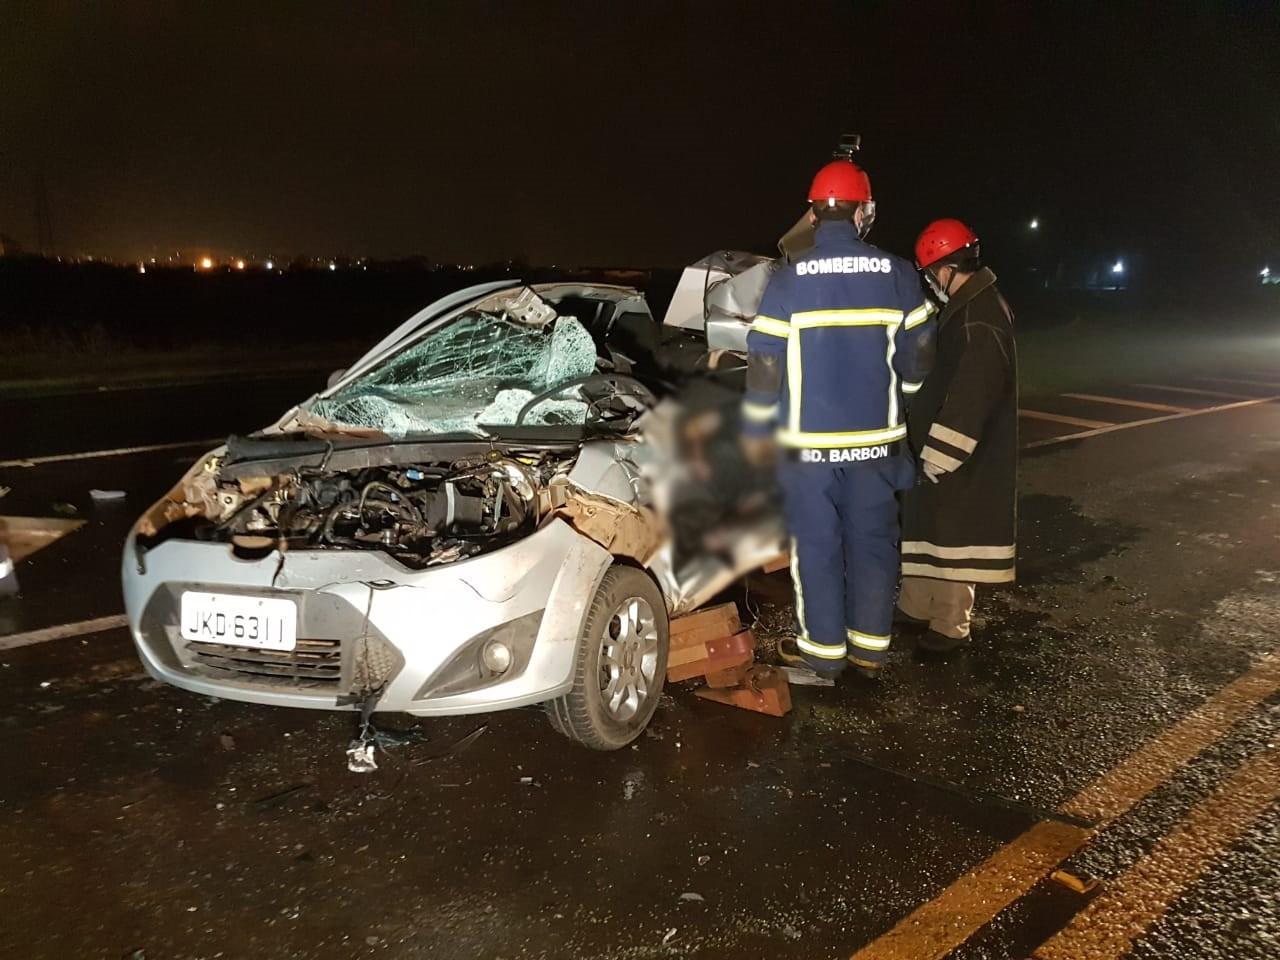 Homem morre em acidente na br-158 e motorista foge sem prestar socorro